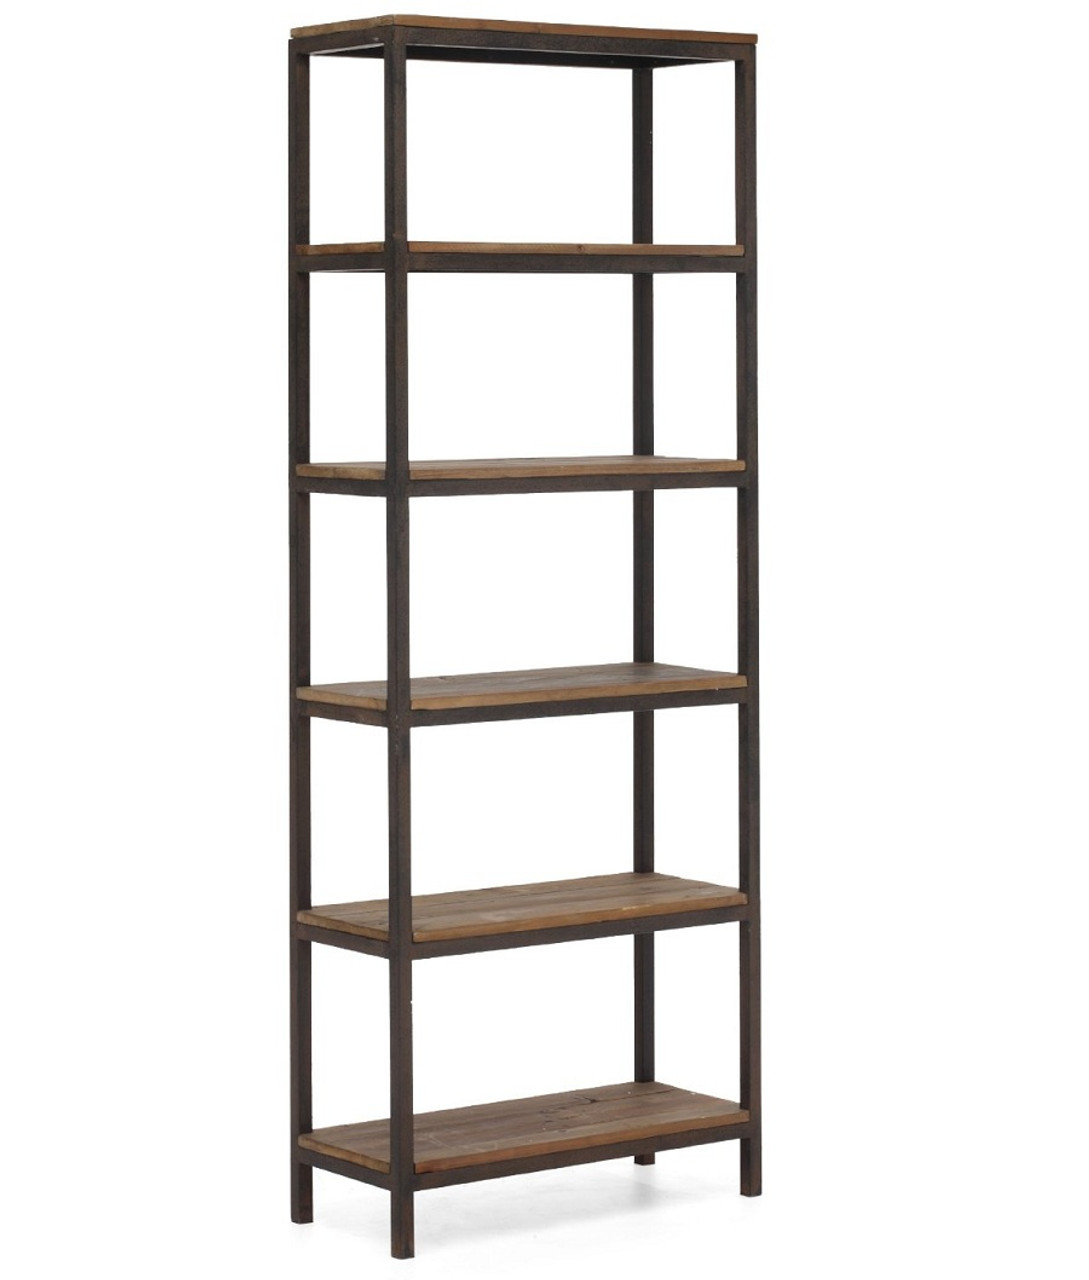 Civic Wood and Metal Bookshelf - Civic Wood And Metal Bookshelf Zin Home